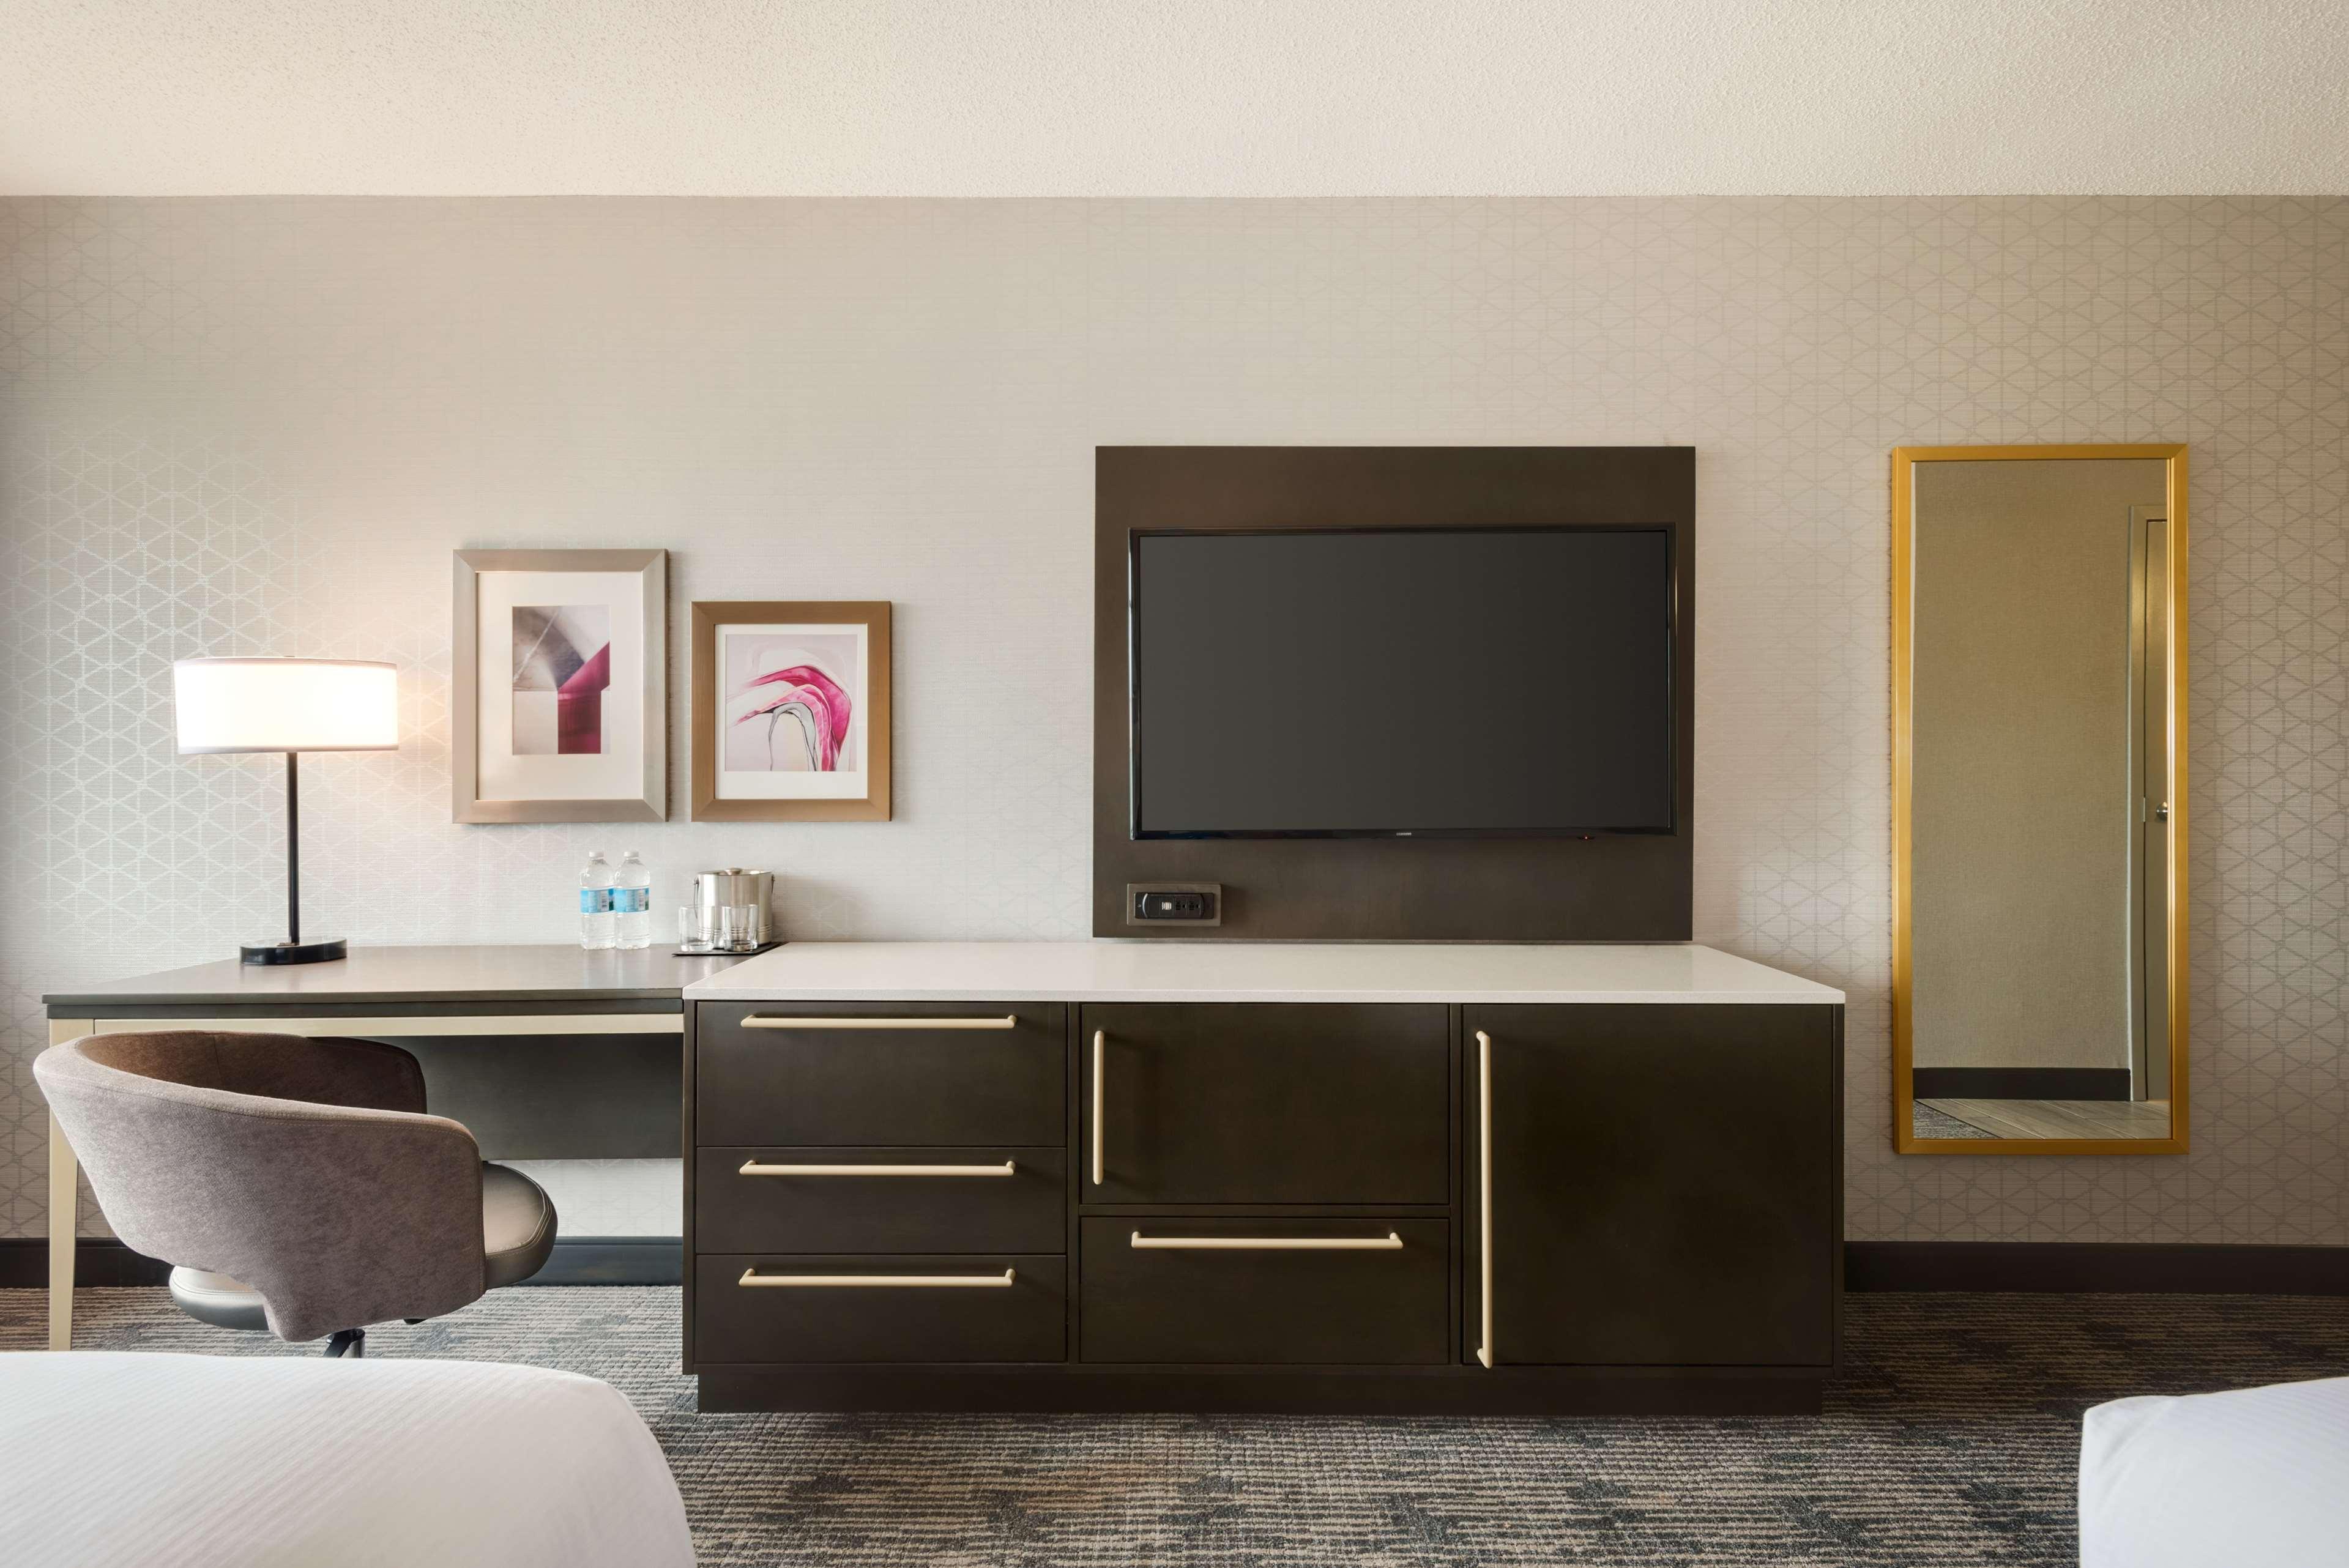 DoubleTree by Hilton St. Paul East image 26